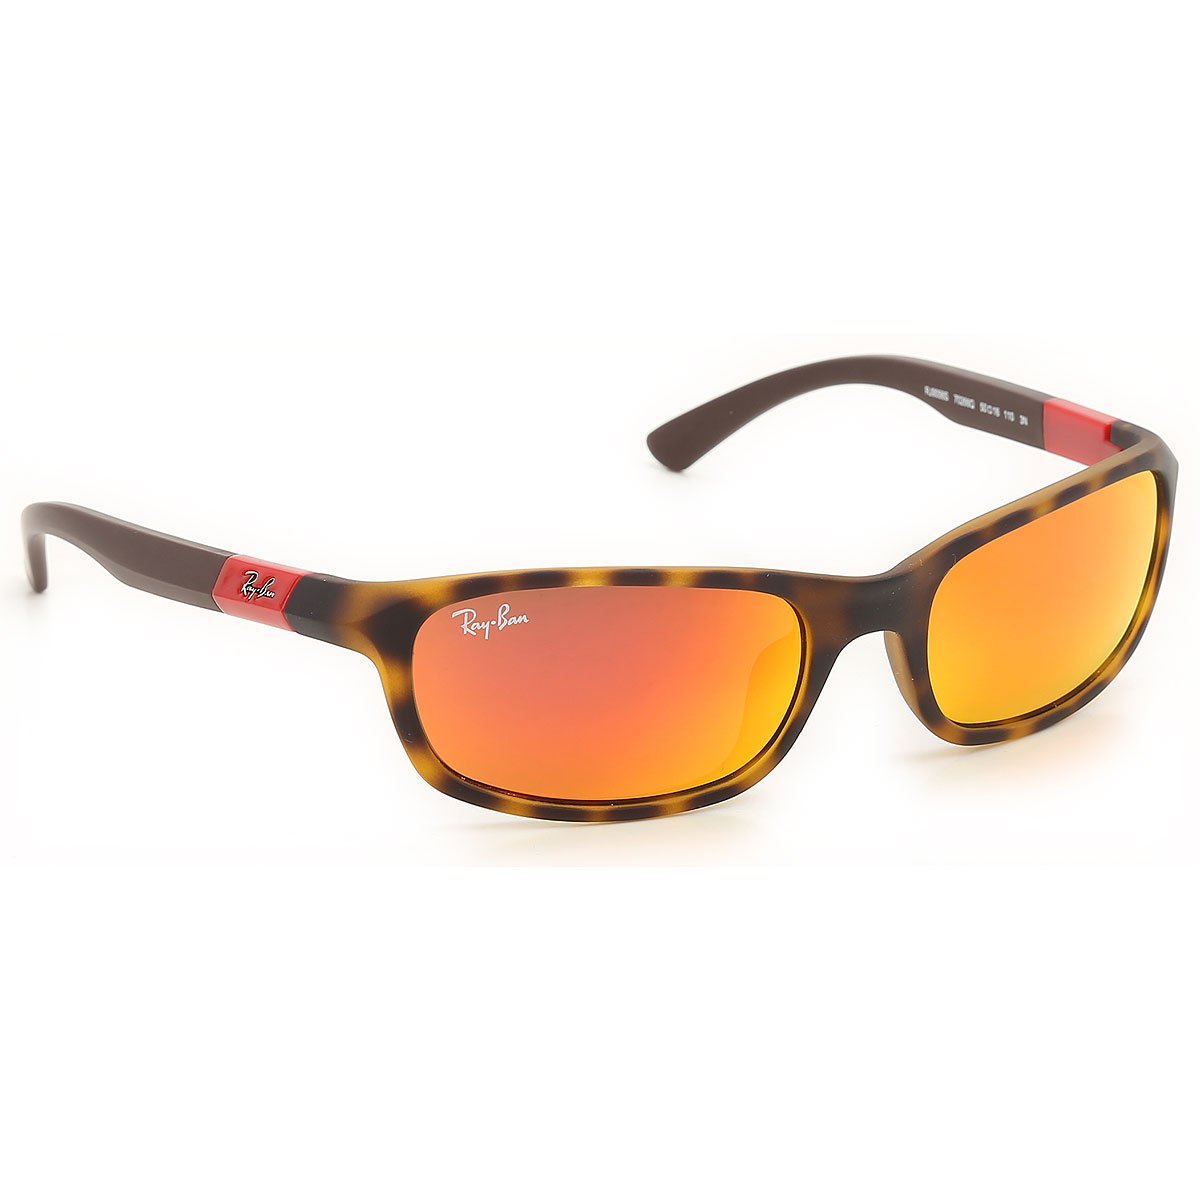 Ray Ban Junior Kids Sunglasses for Boys On Sale, Matt Havana, 2017 USA-407369